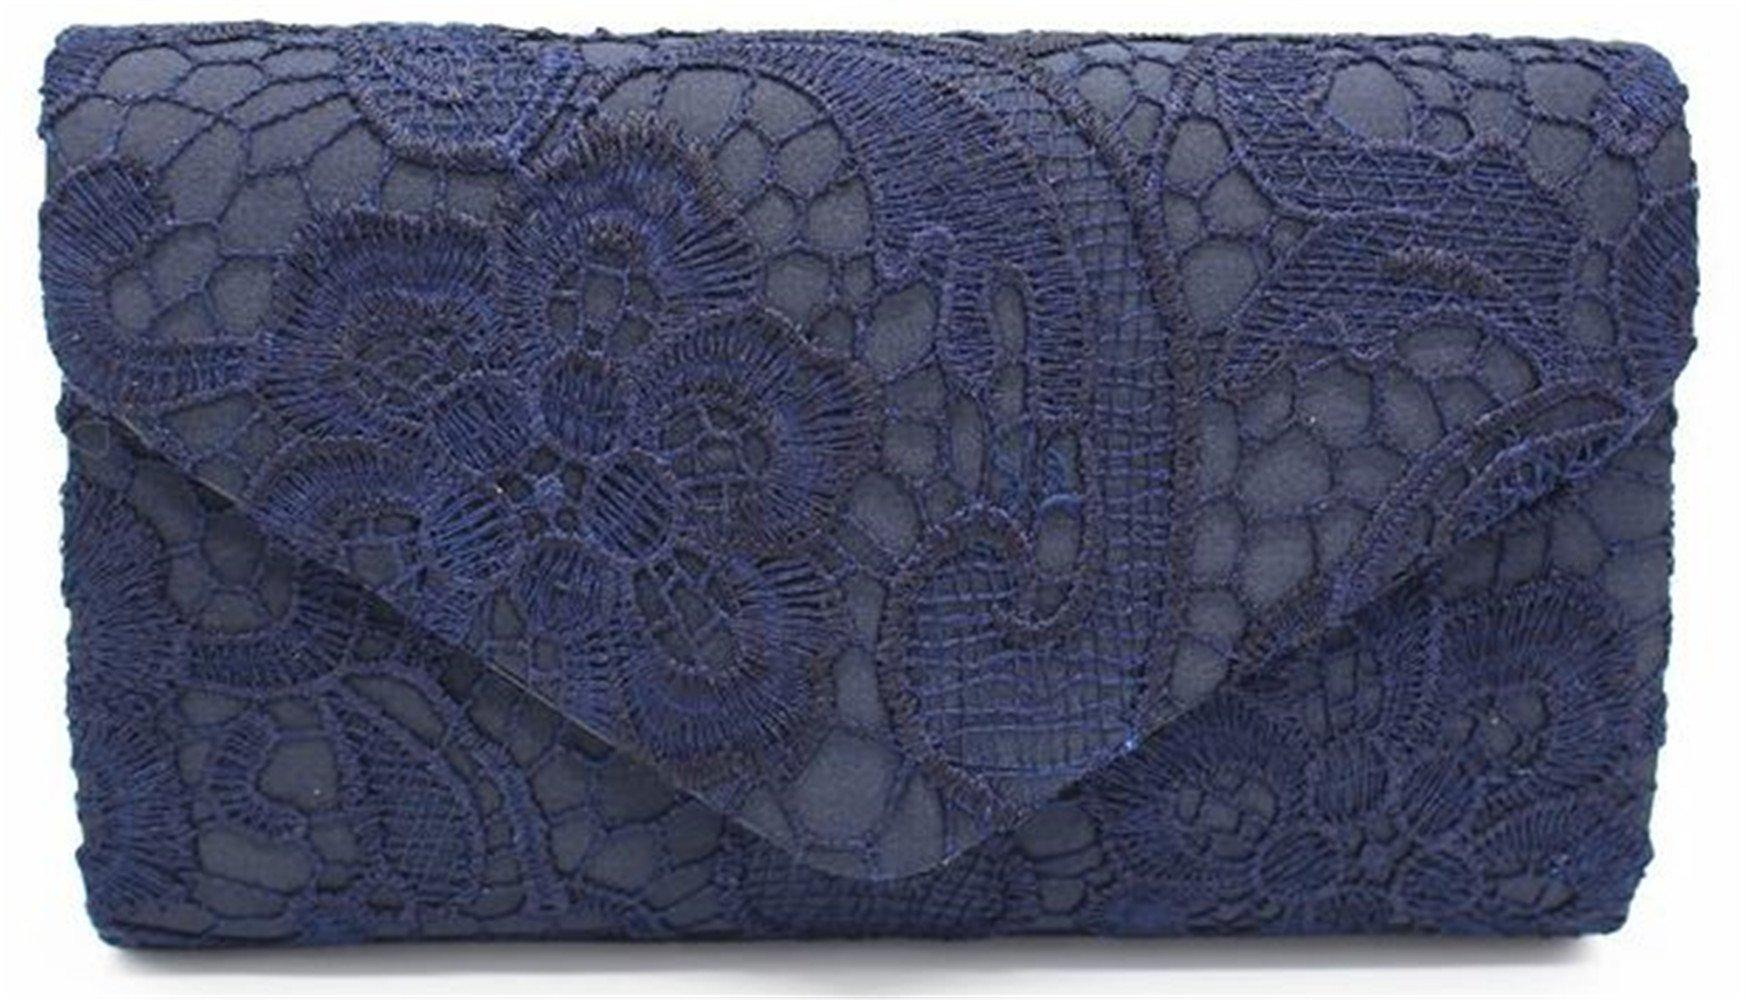 Nodykka Wedding Pleated Floral Lace Clutches Bag Evening Cross Body Handbags Purse by Nodykka (Image #1)